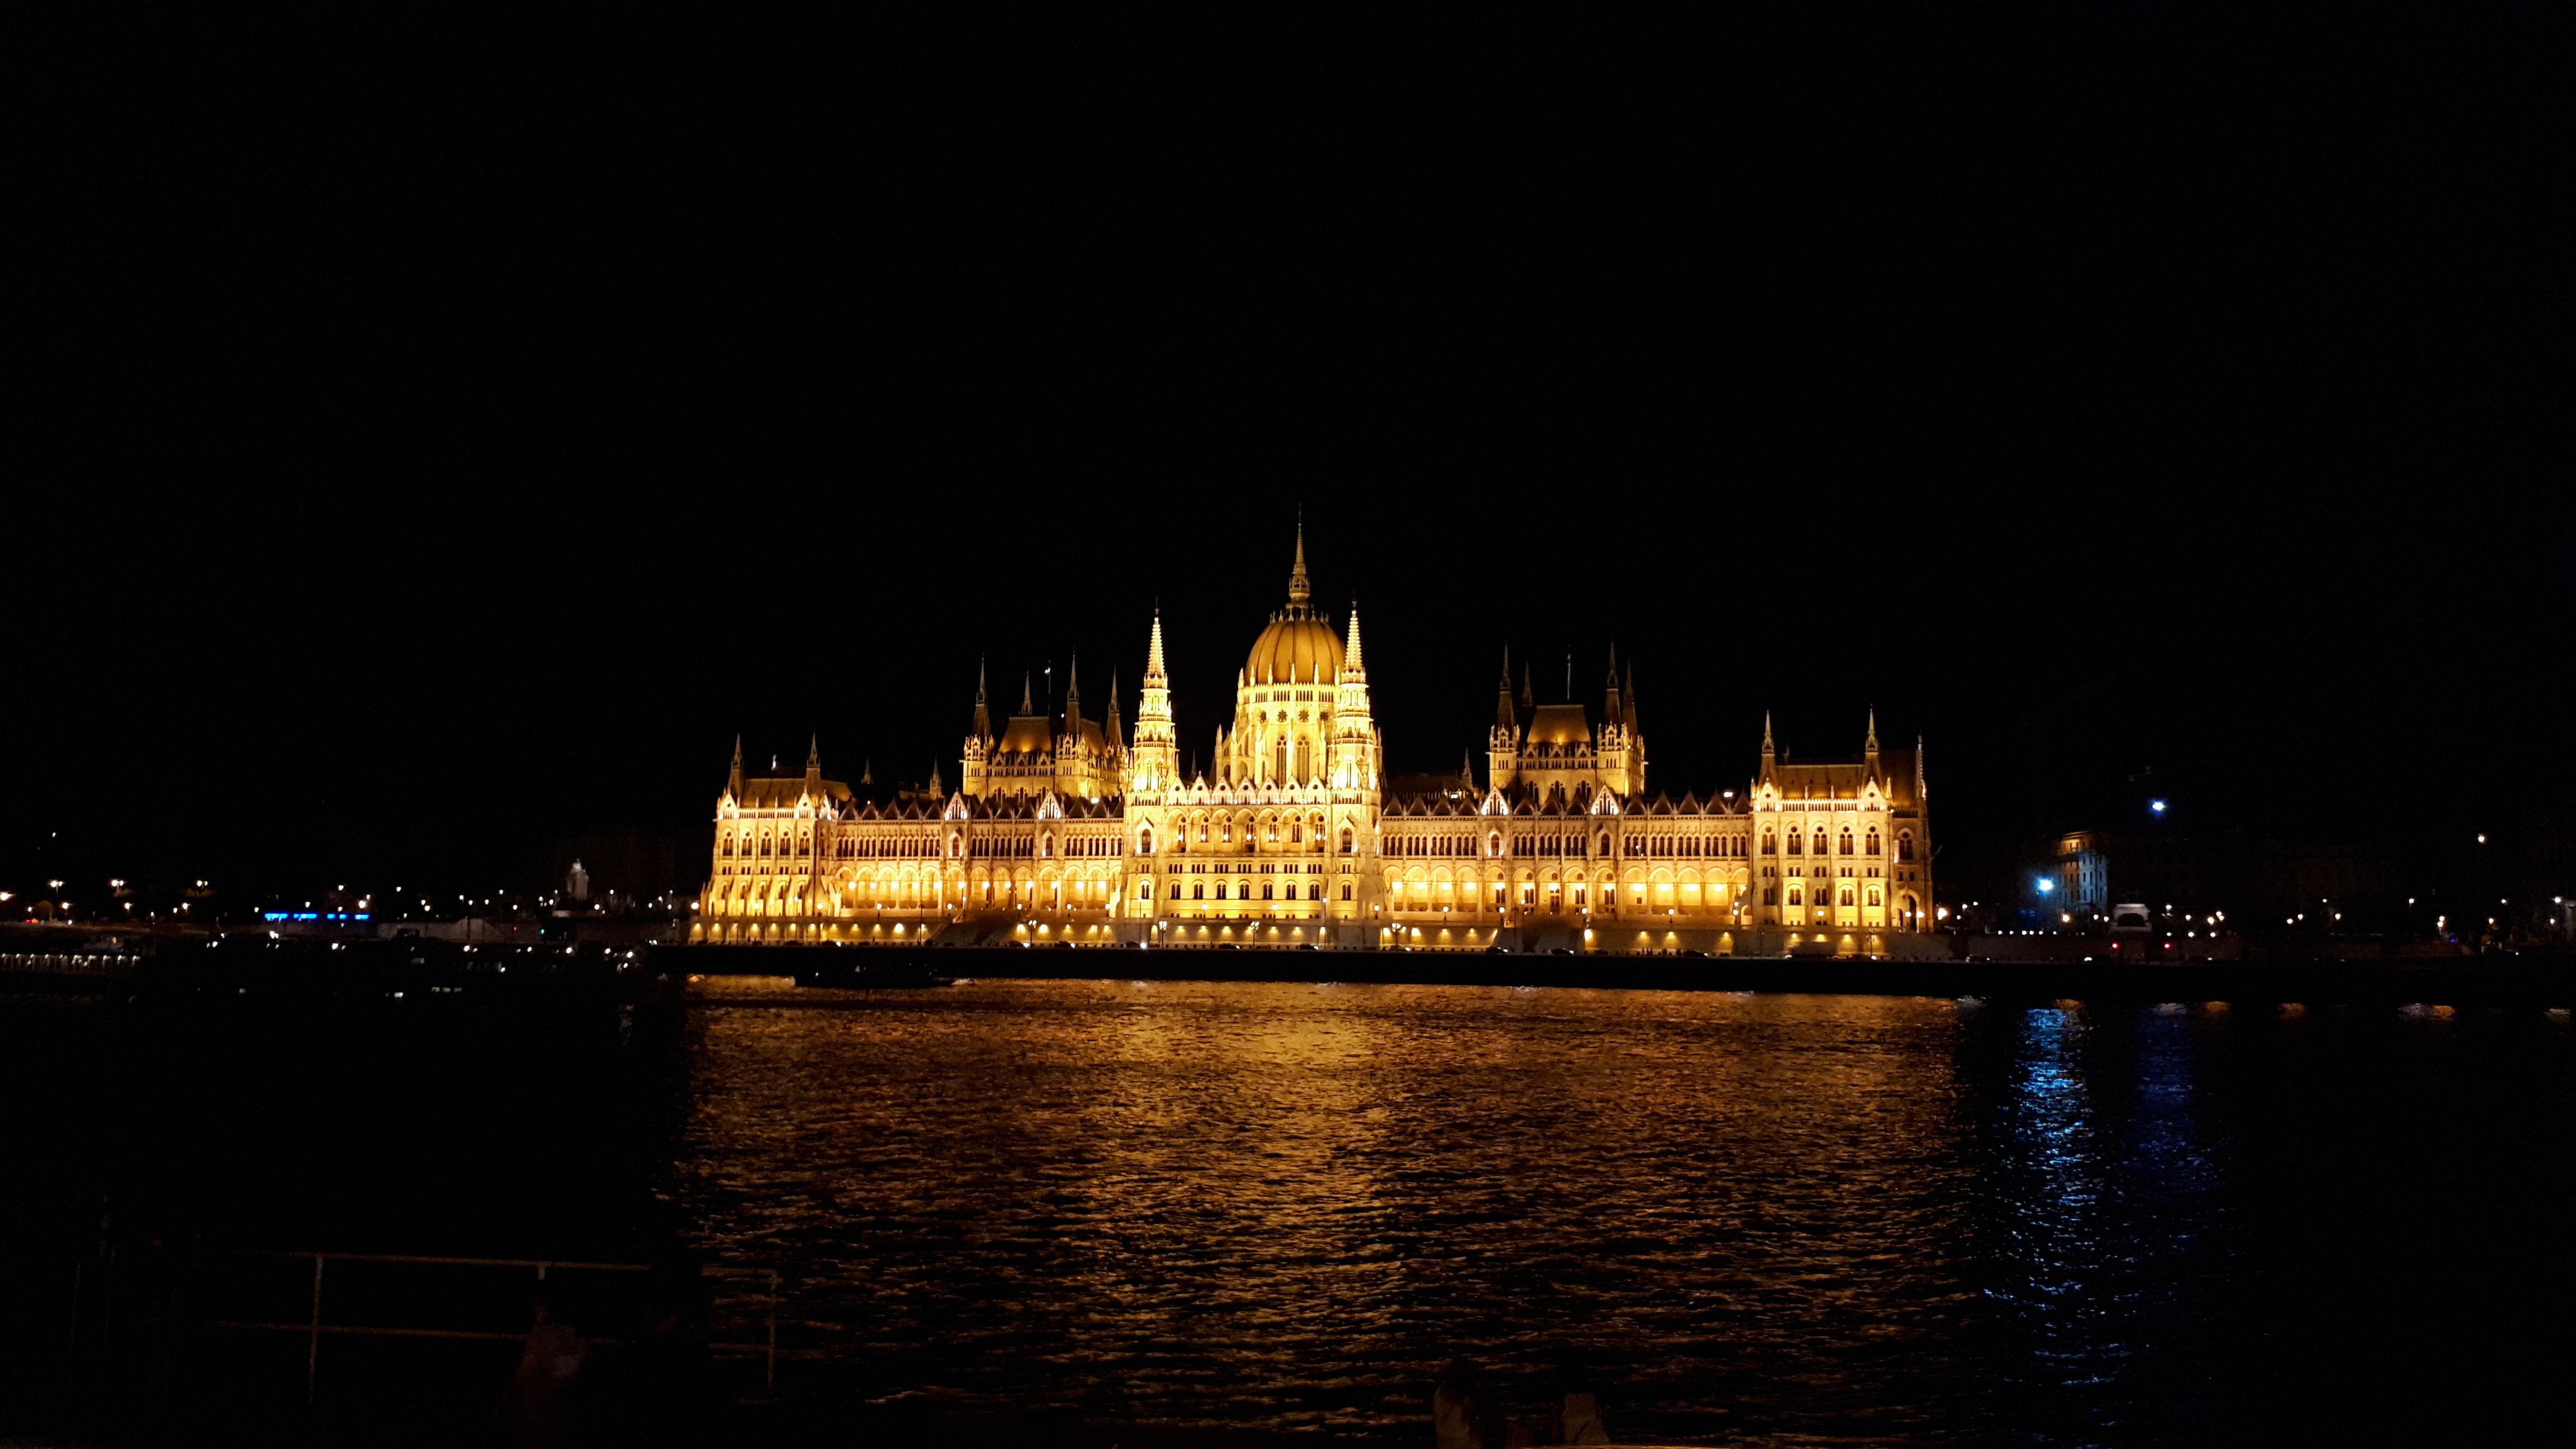 Budapestin parlamenttitalo